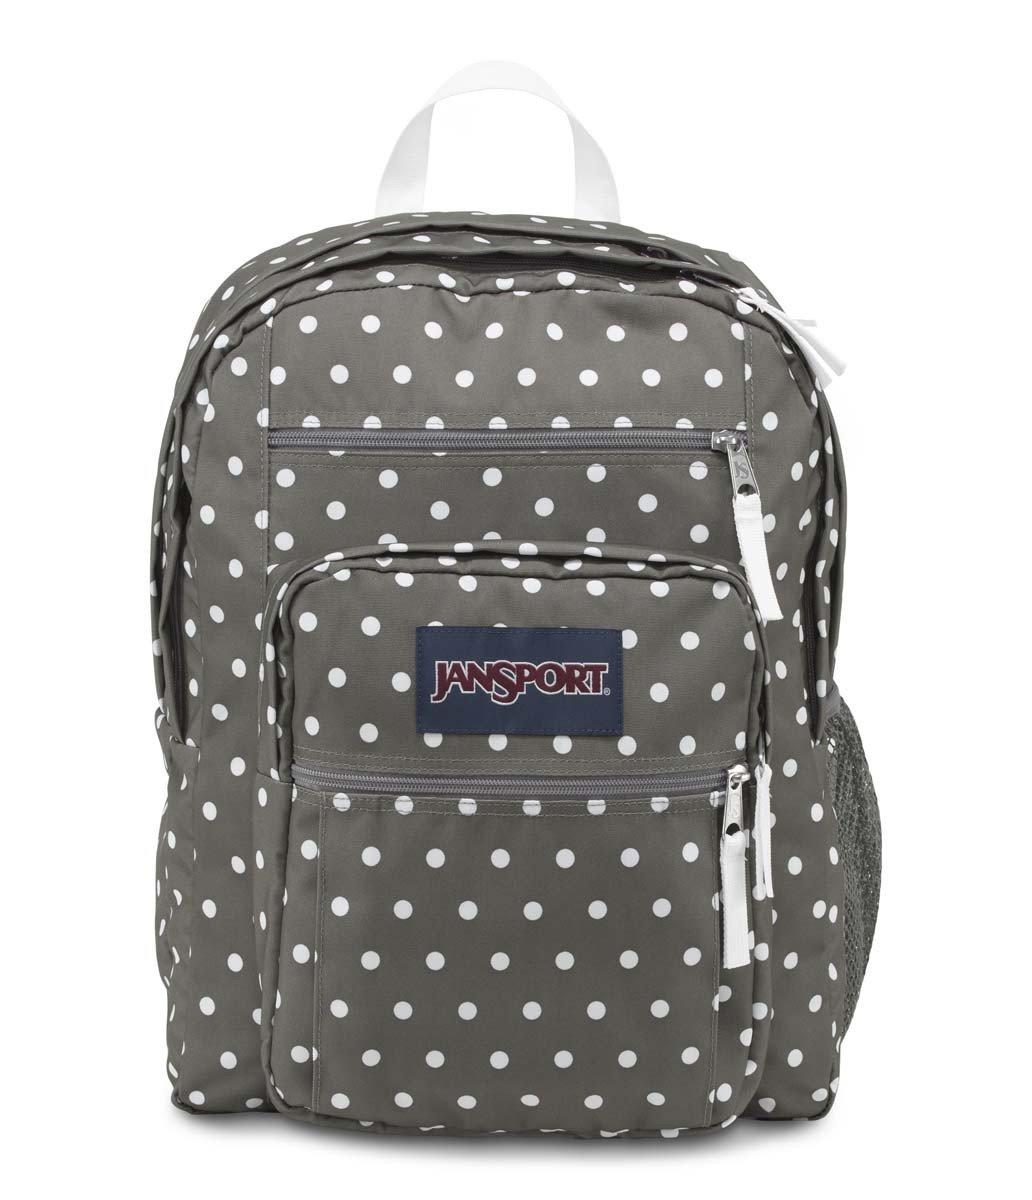 JanSport Big Student Backpack (Shady Grey/White Dots)